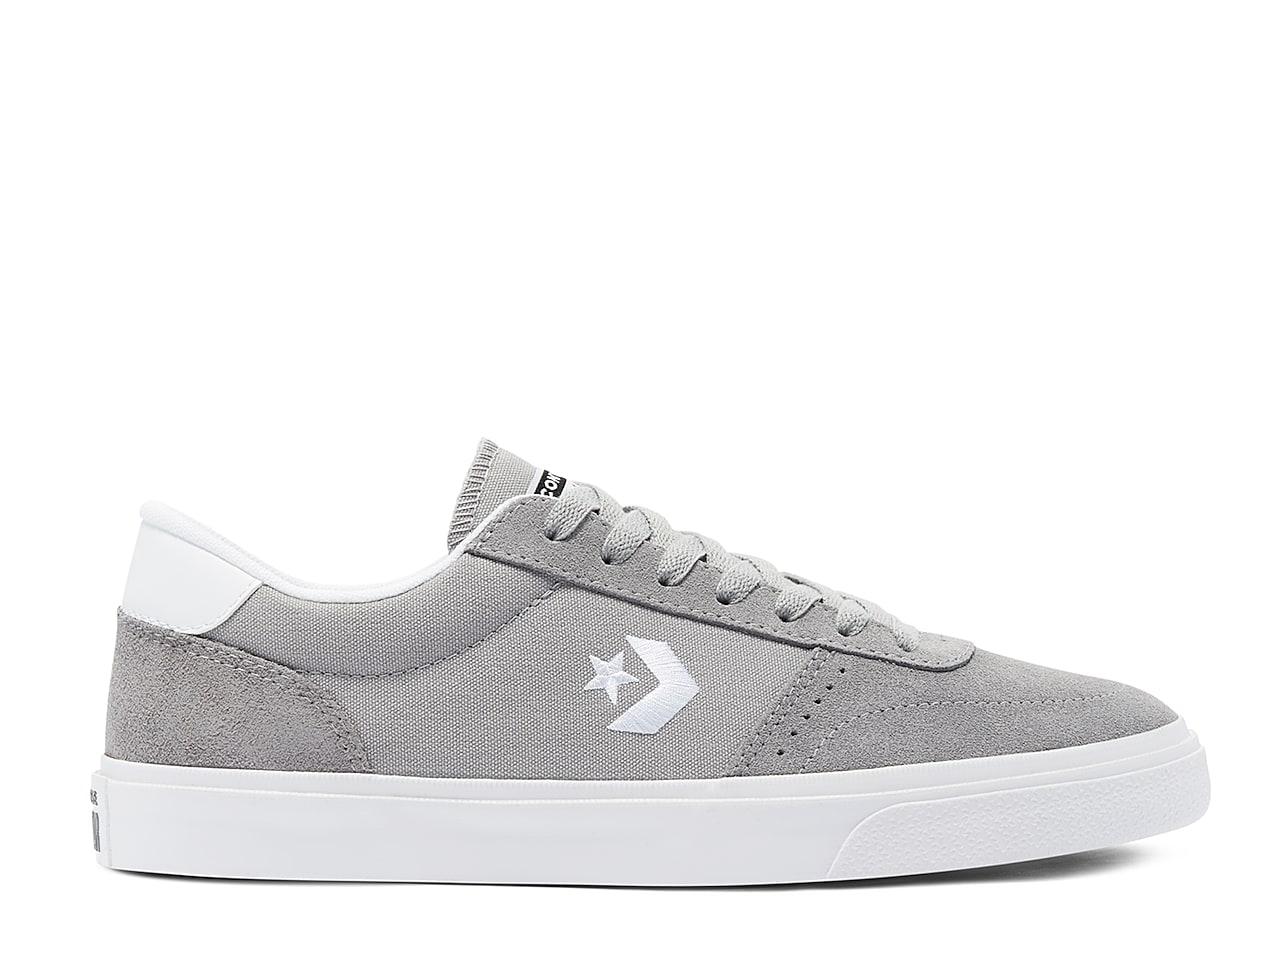 Converse Chuck Taylor All Star Boulevard Sneaker - Men's